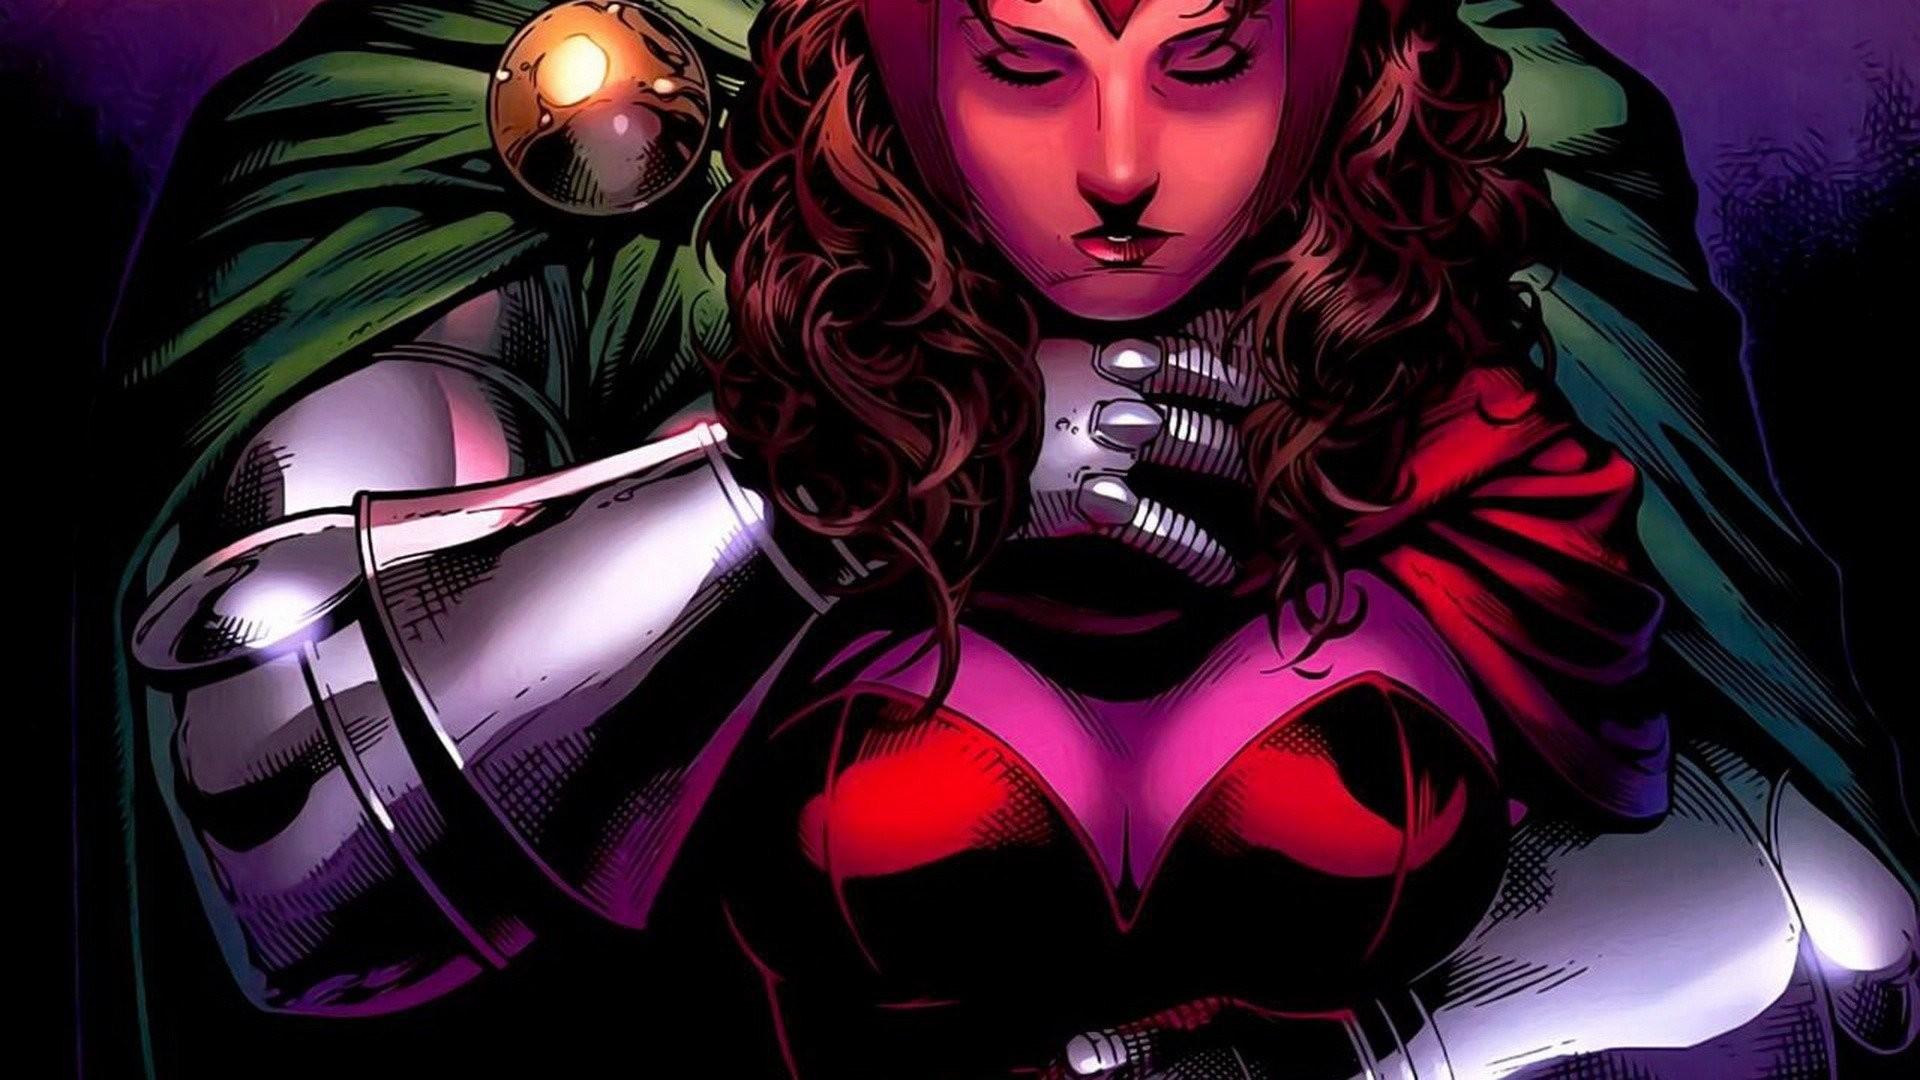 Res: 1920x1080, Comics Marvel Comics Scarlet Witch comics girls Dr_ Doom Avengers wallpaper  |  | 300321 | WallpaperUP